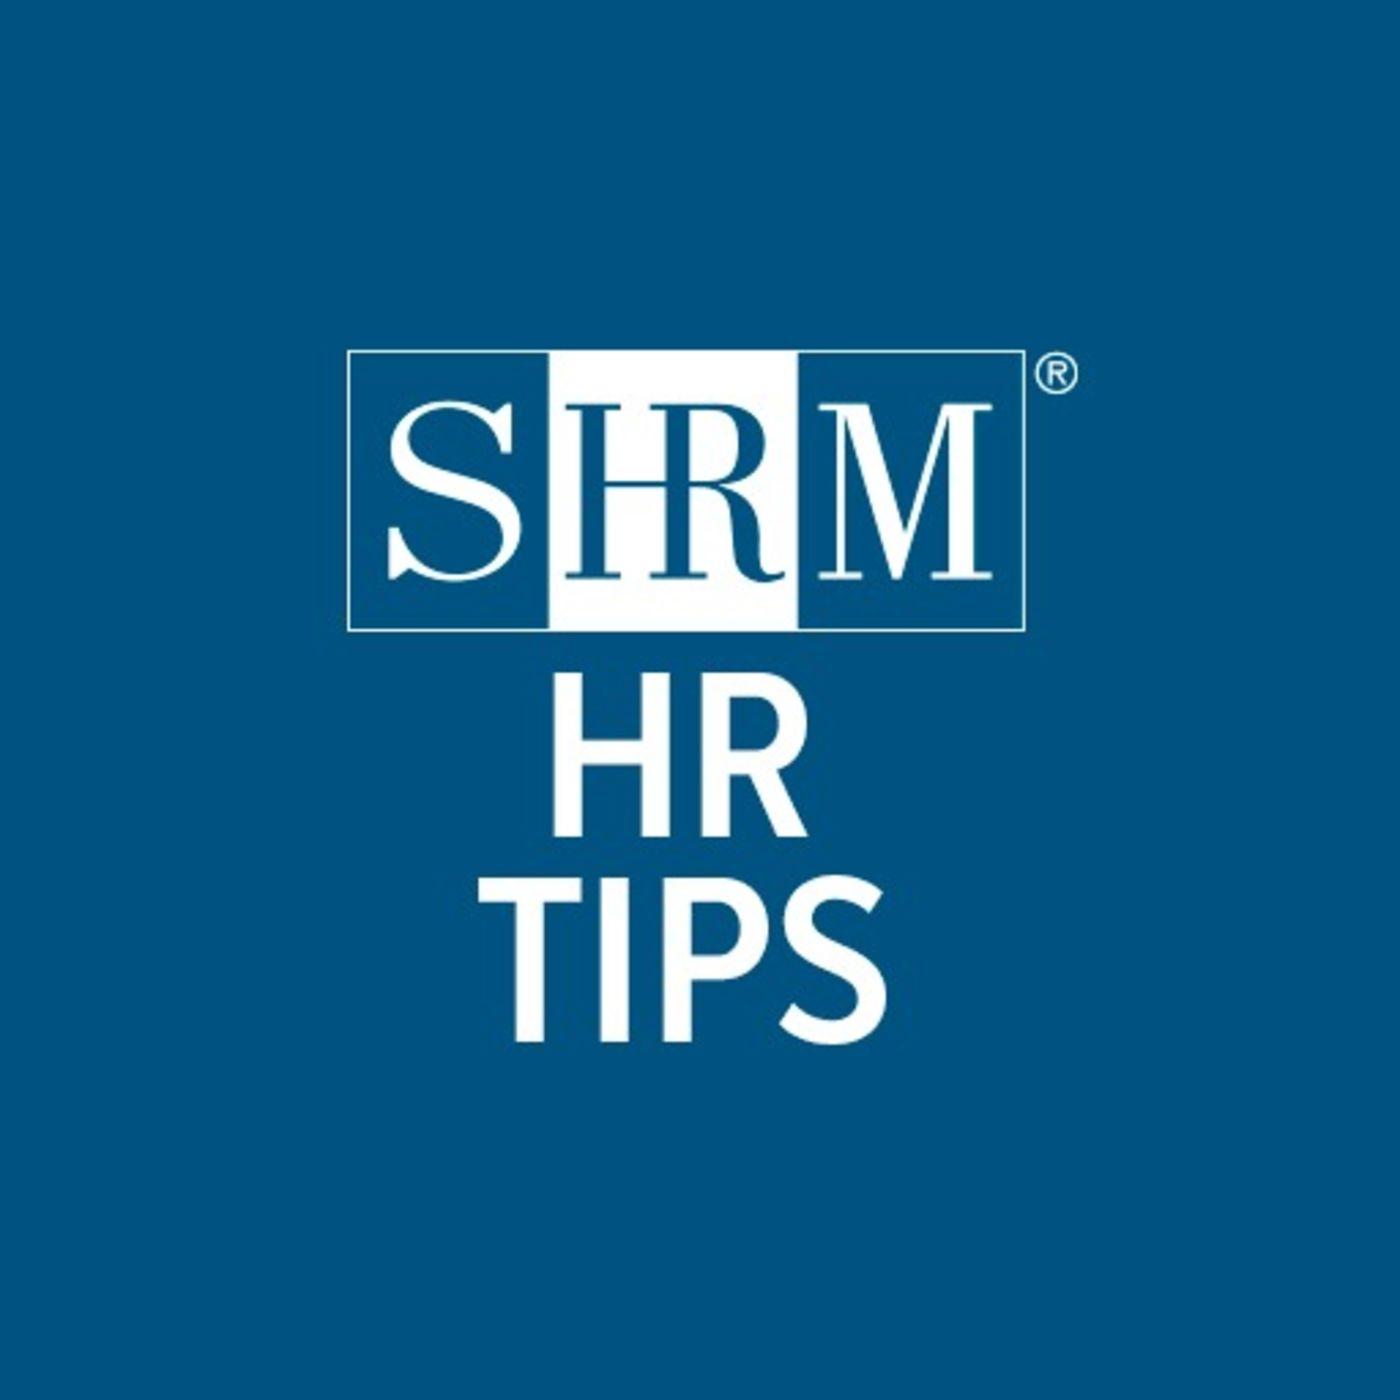 SHRM HR Tips